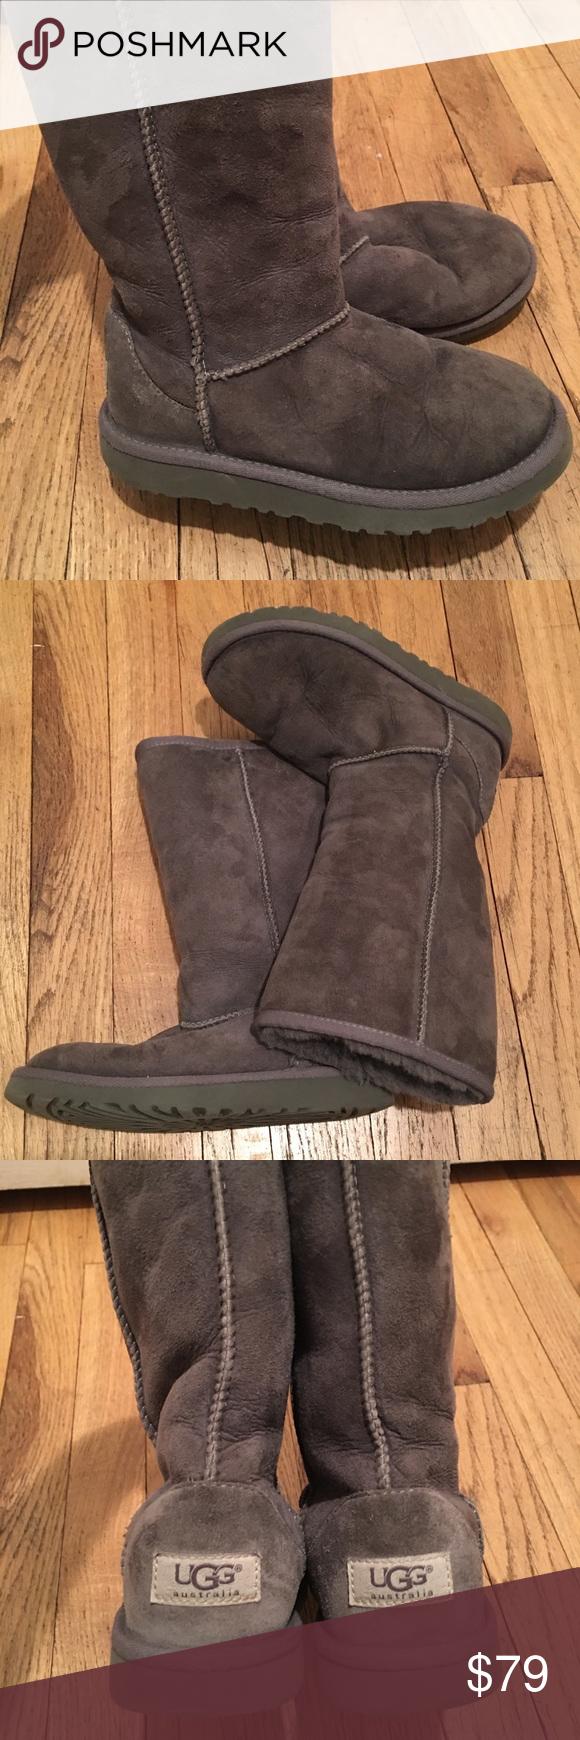 ce95520c7db Uggs Kids Classic Tall Boots Grey Kids tall grey ugg boots, size 2 ...